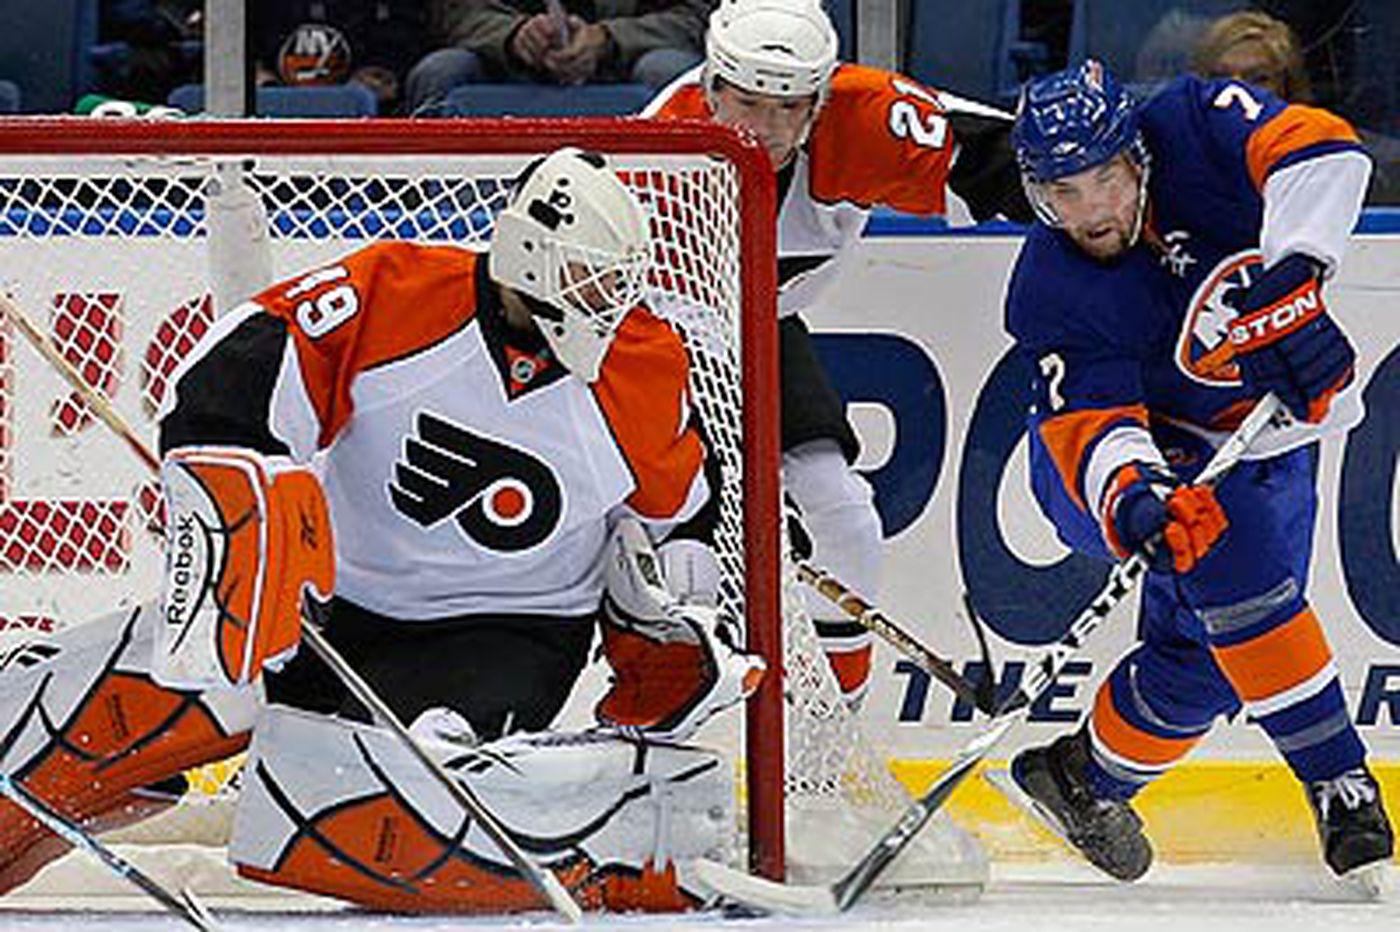 Flyers win third straight